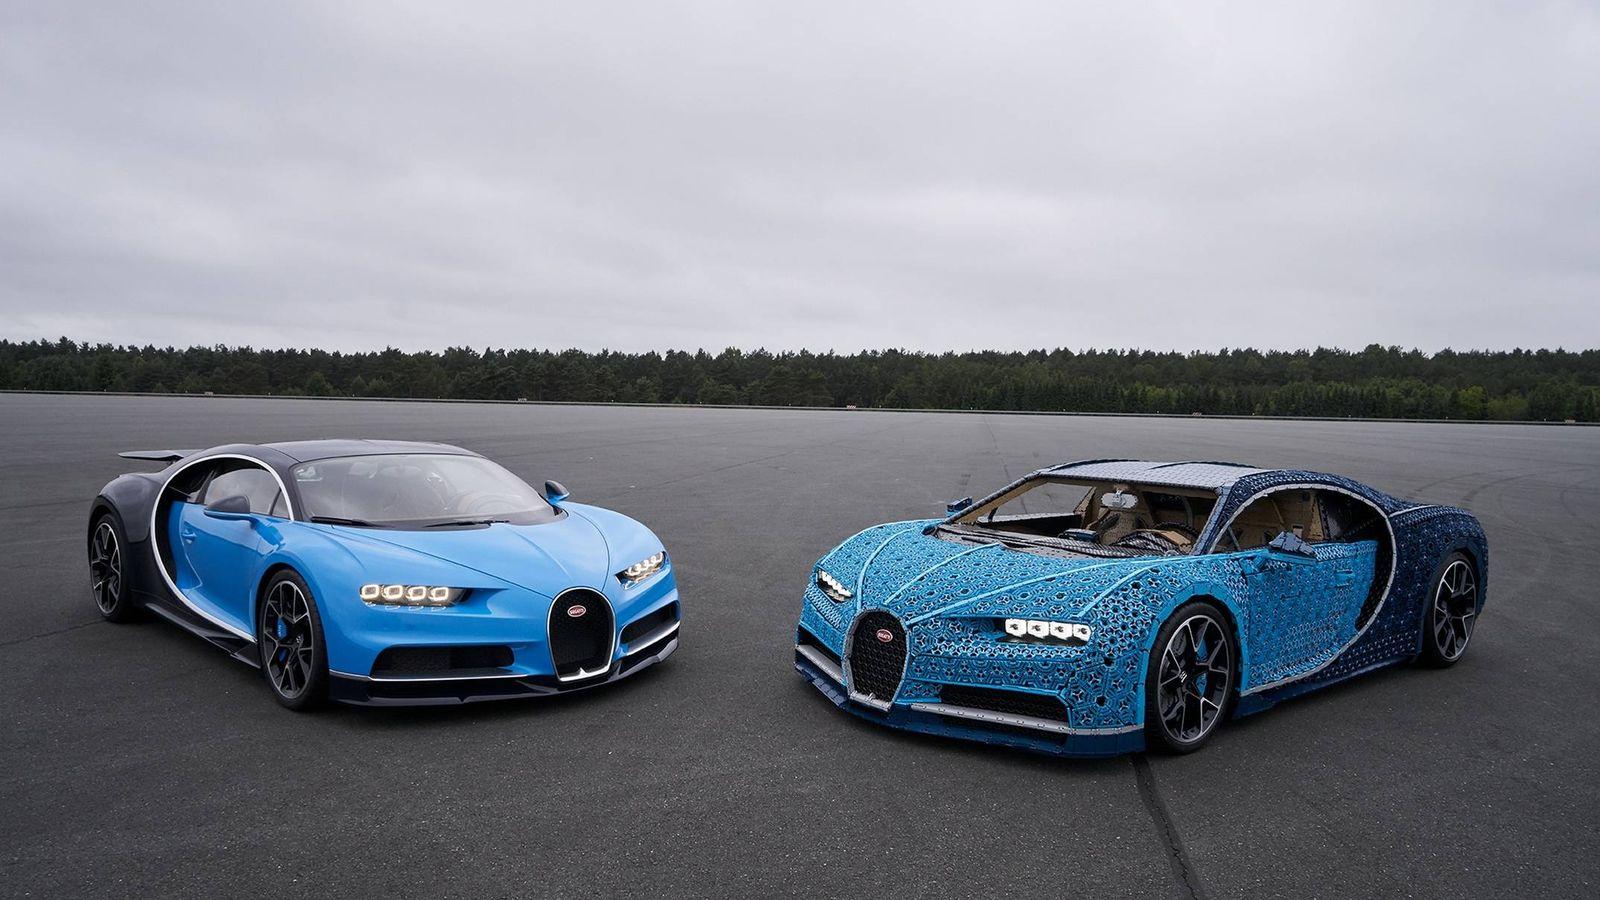 Foto: El Bugatti de Lego, a la derecha, junto a un Chiron original muestran un aspecto muy similar.